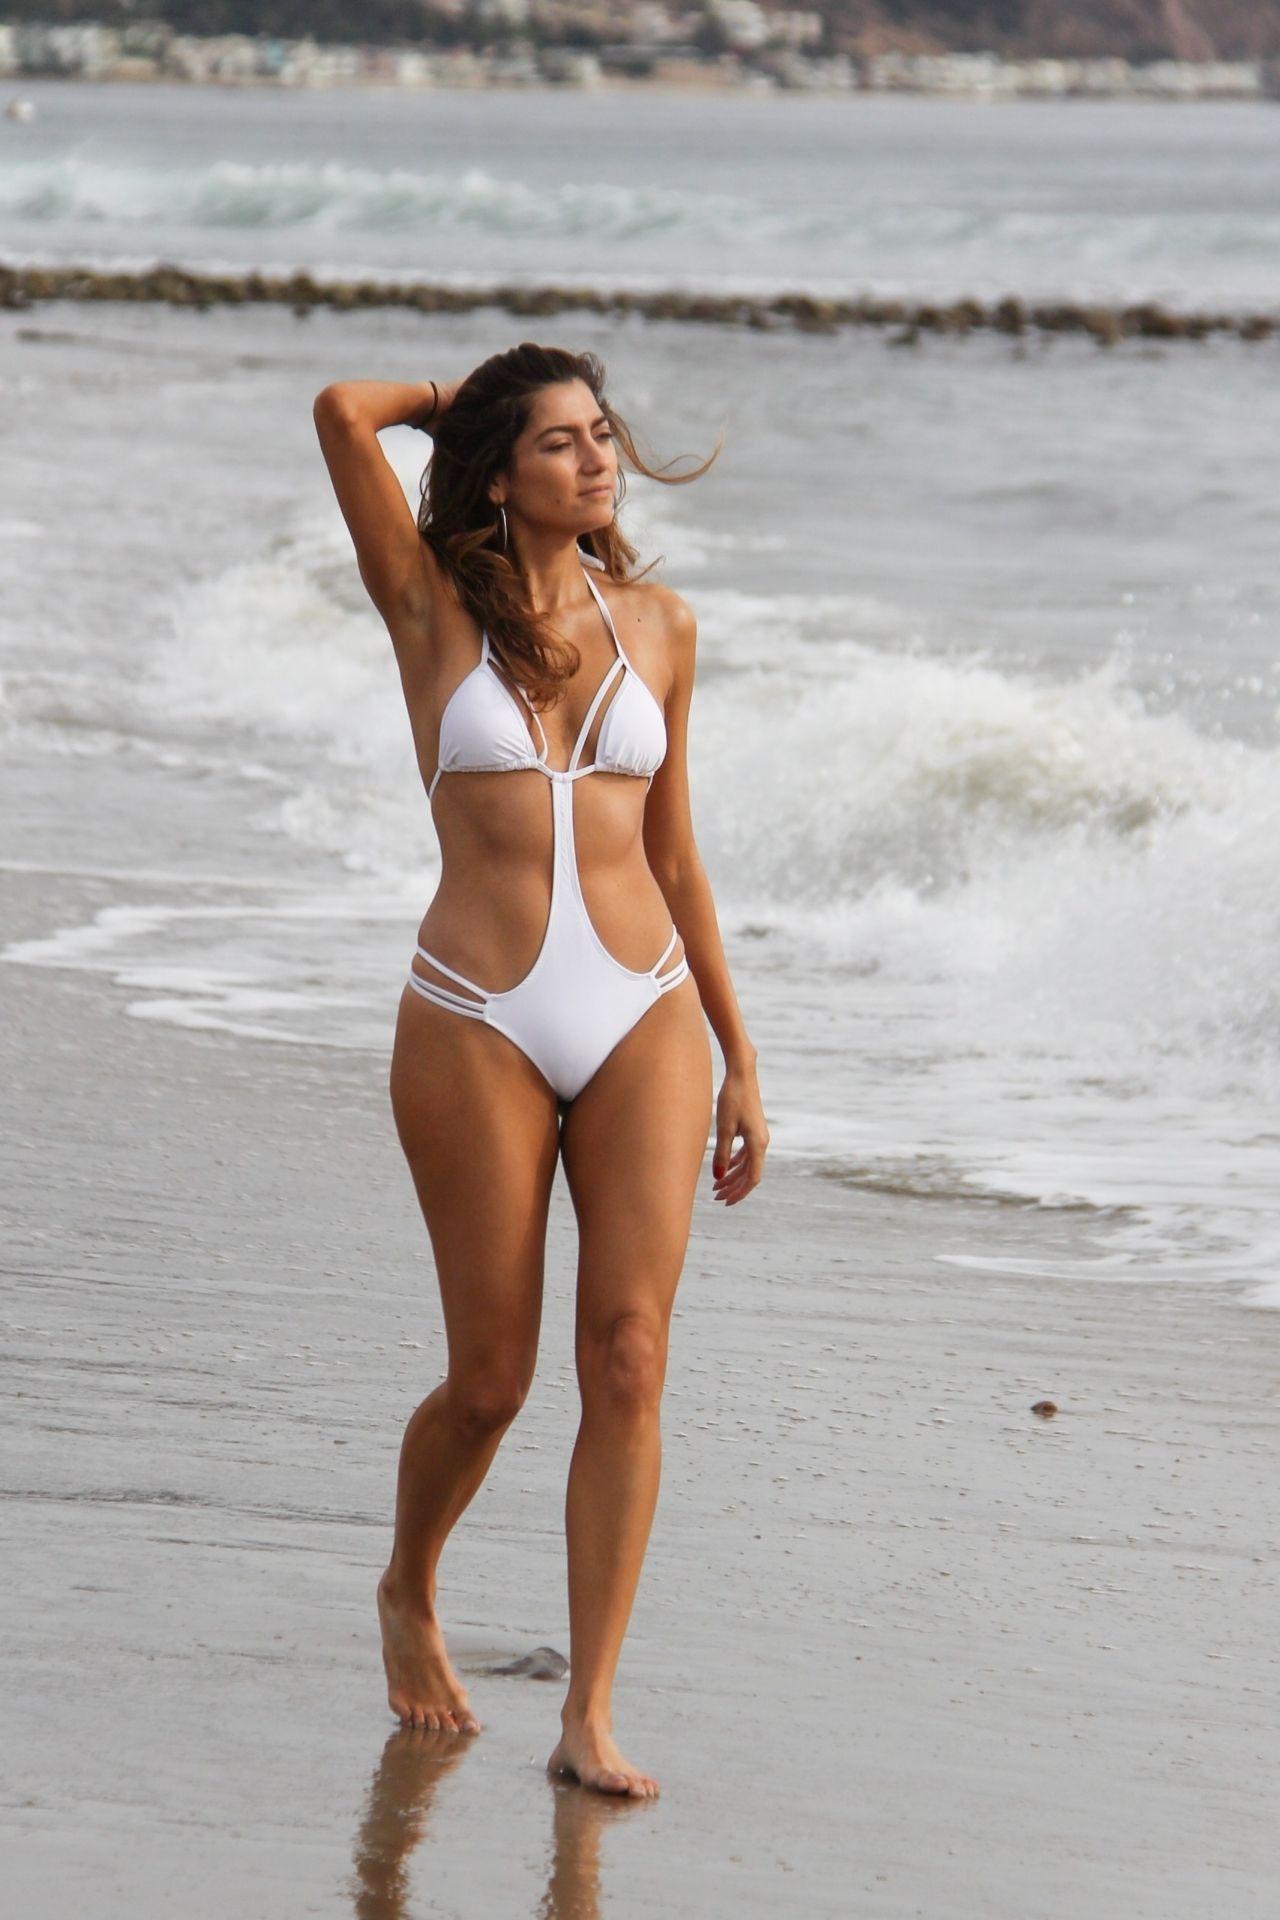 Blanca Blanco In A White One Piece Swimsuit Malibu 12 12